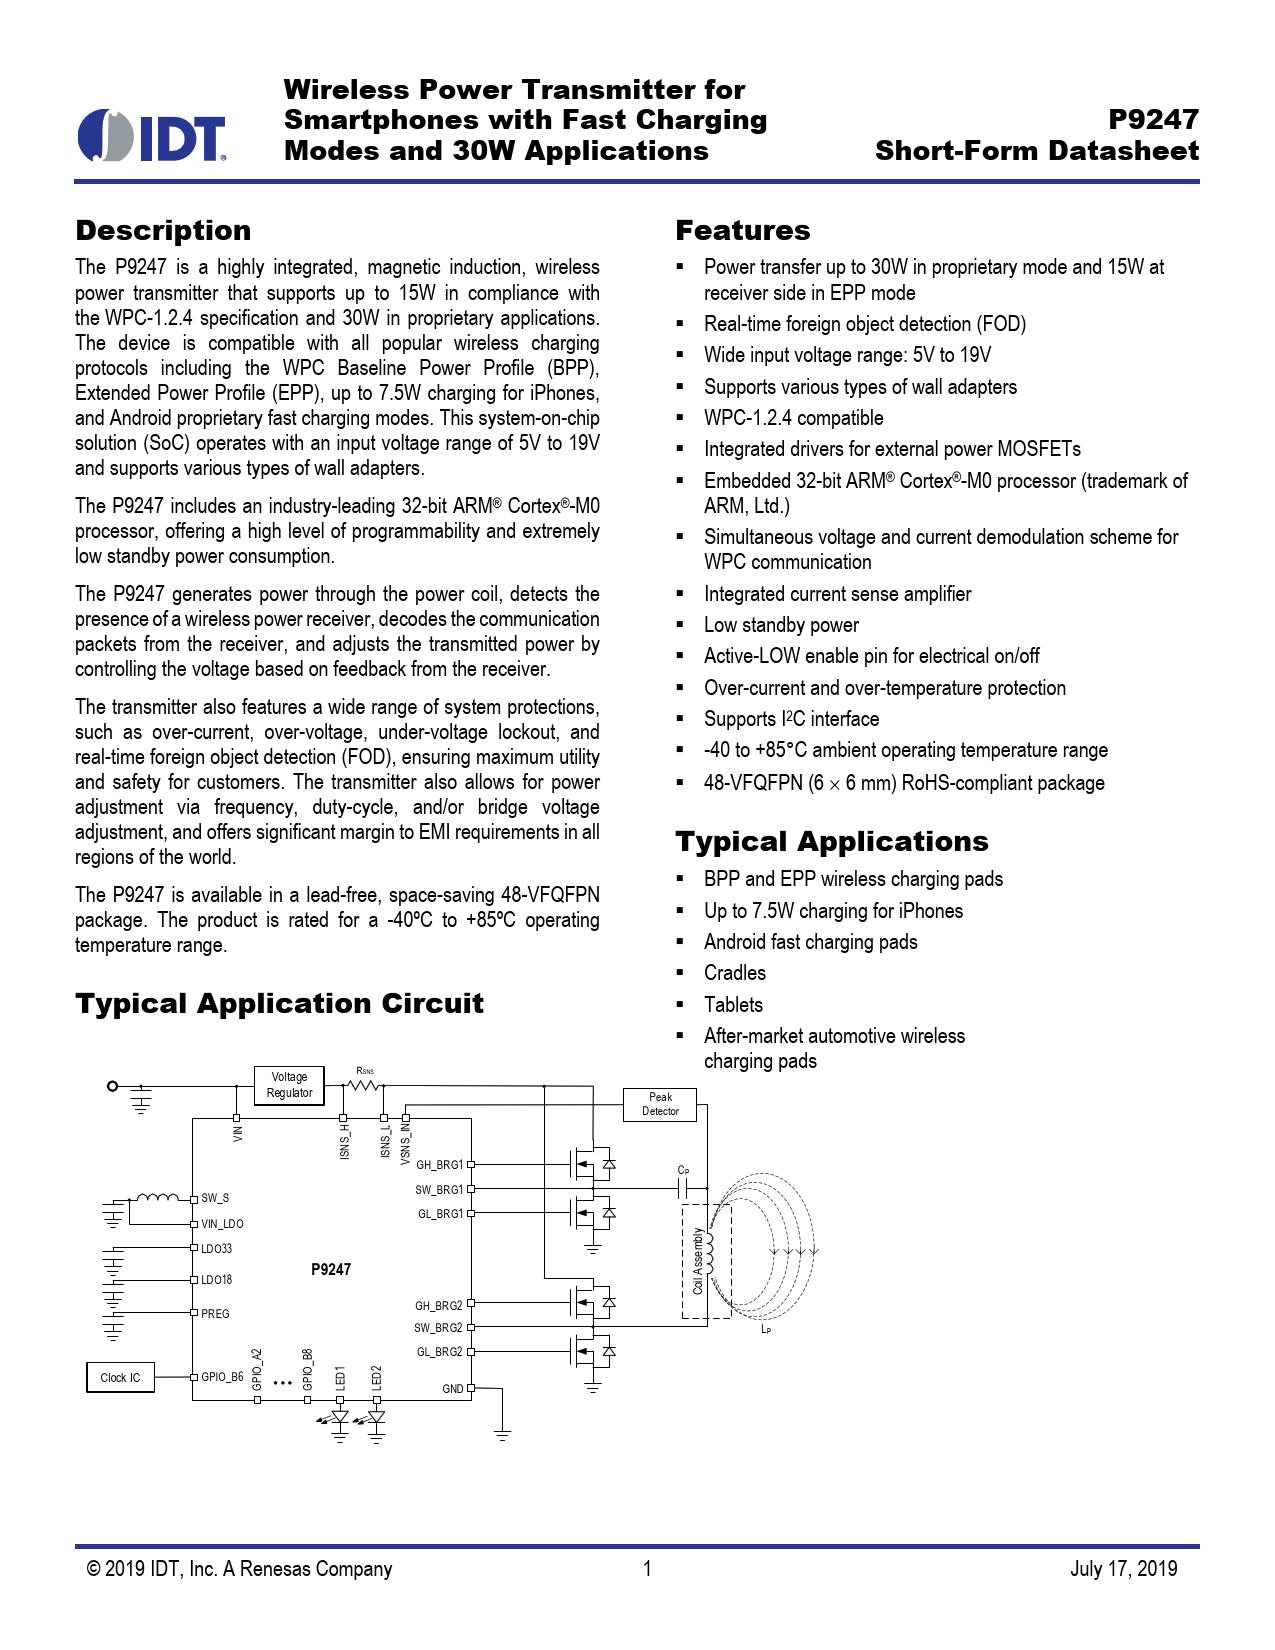 Short-Form Datasheet P9247 IDT